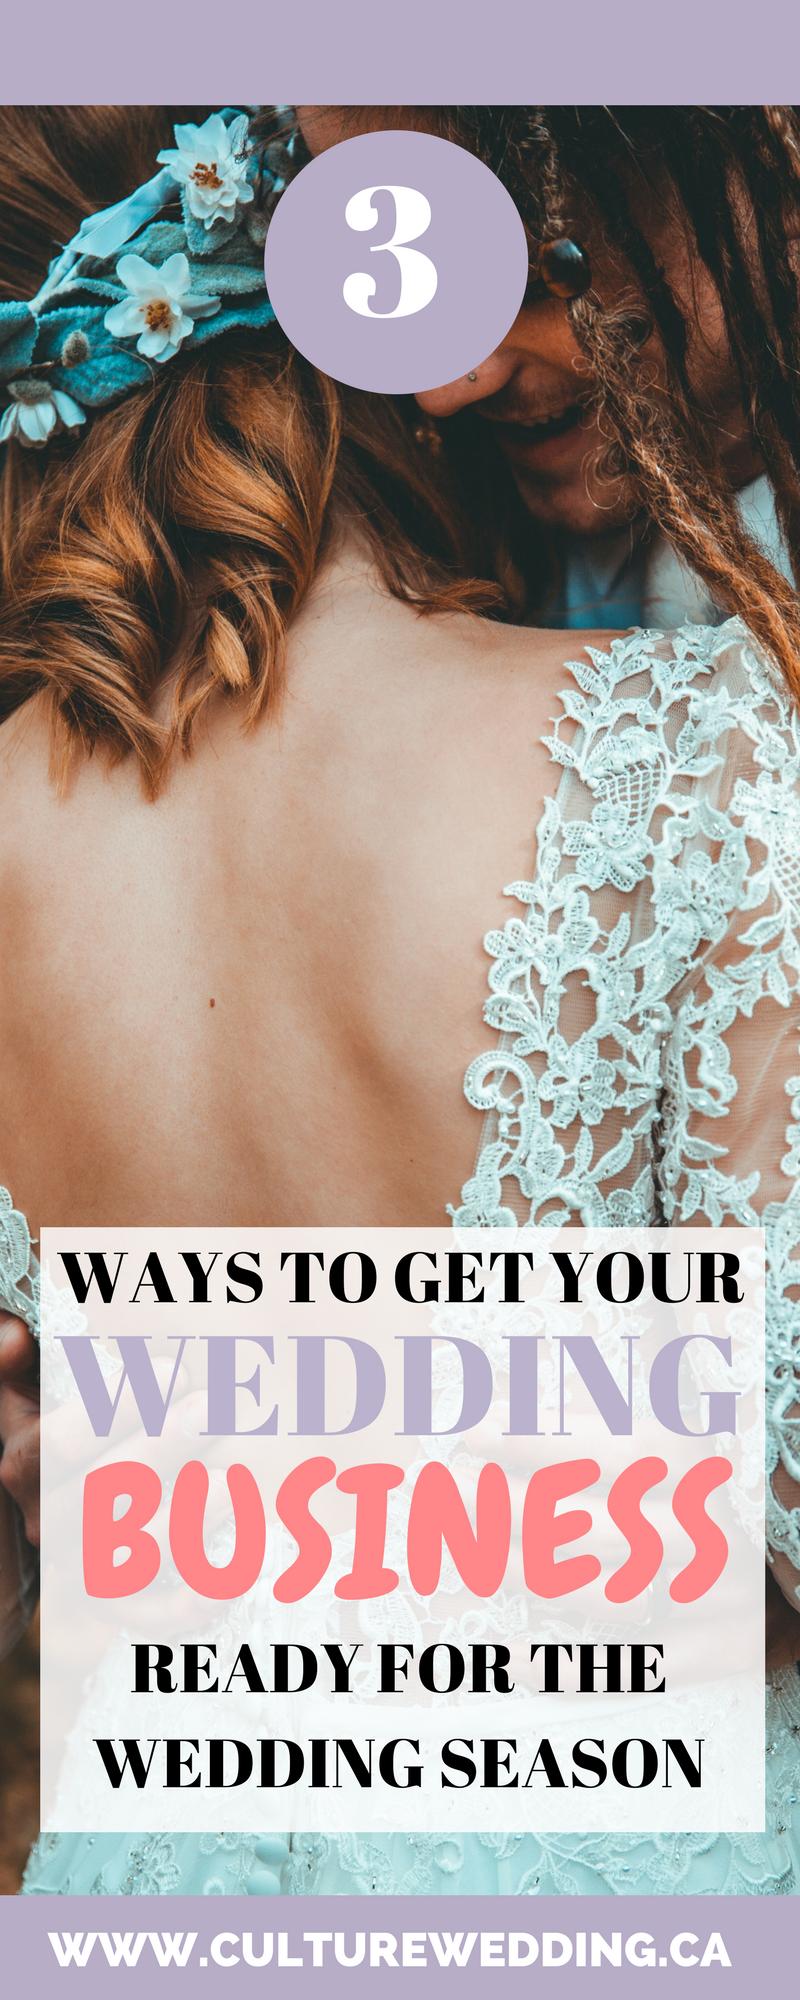 book more weddings. How to get more weddings